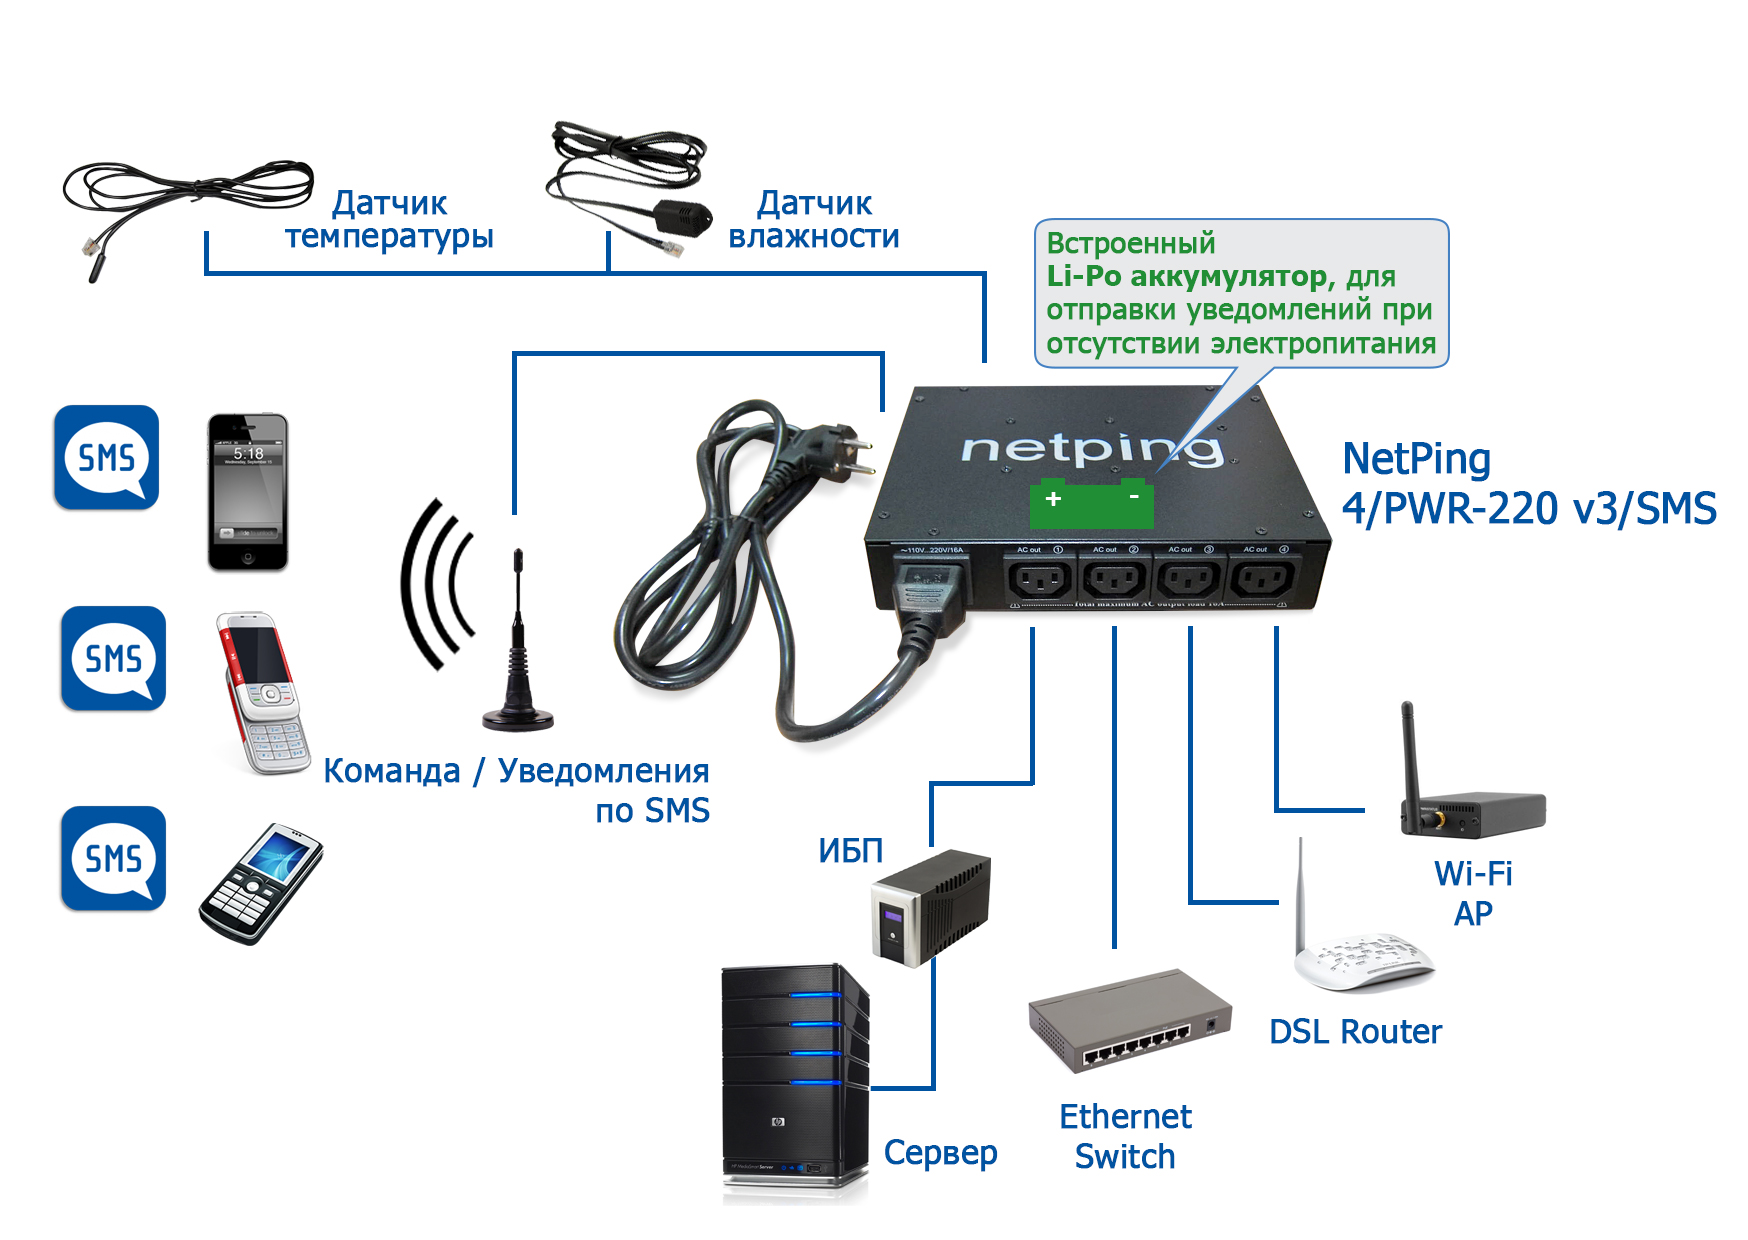 NetPing 4/PWR-220 v3/SMS - нагрузка и датчики